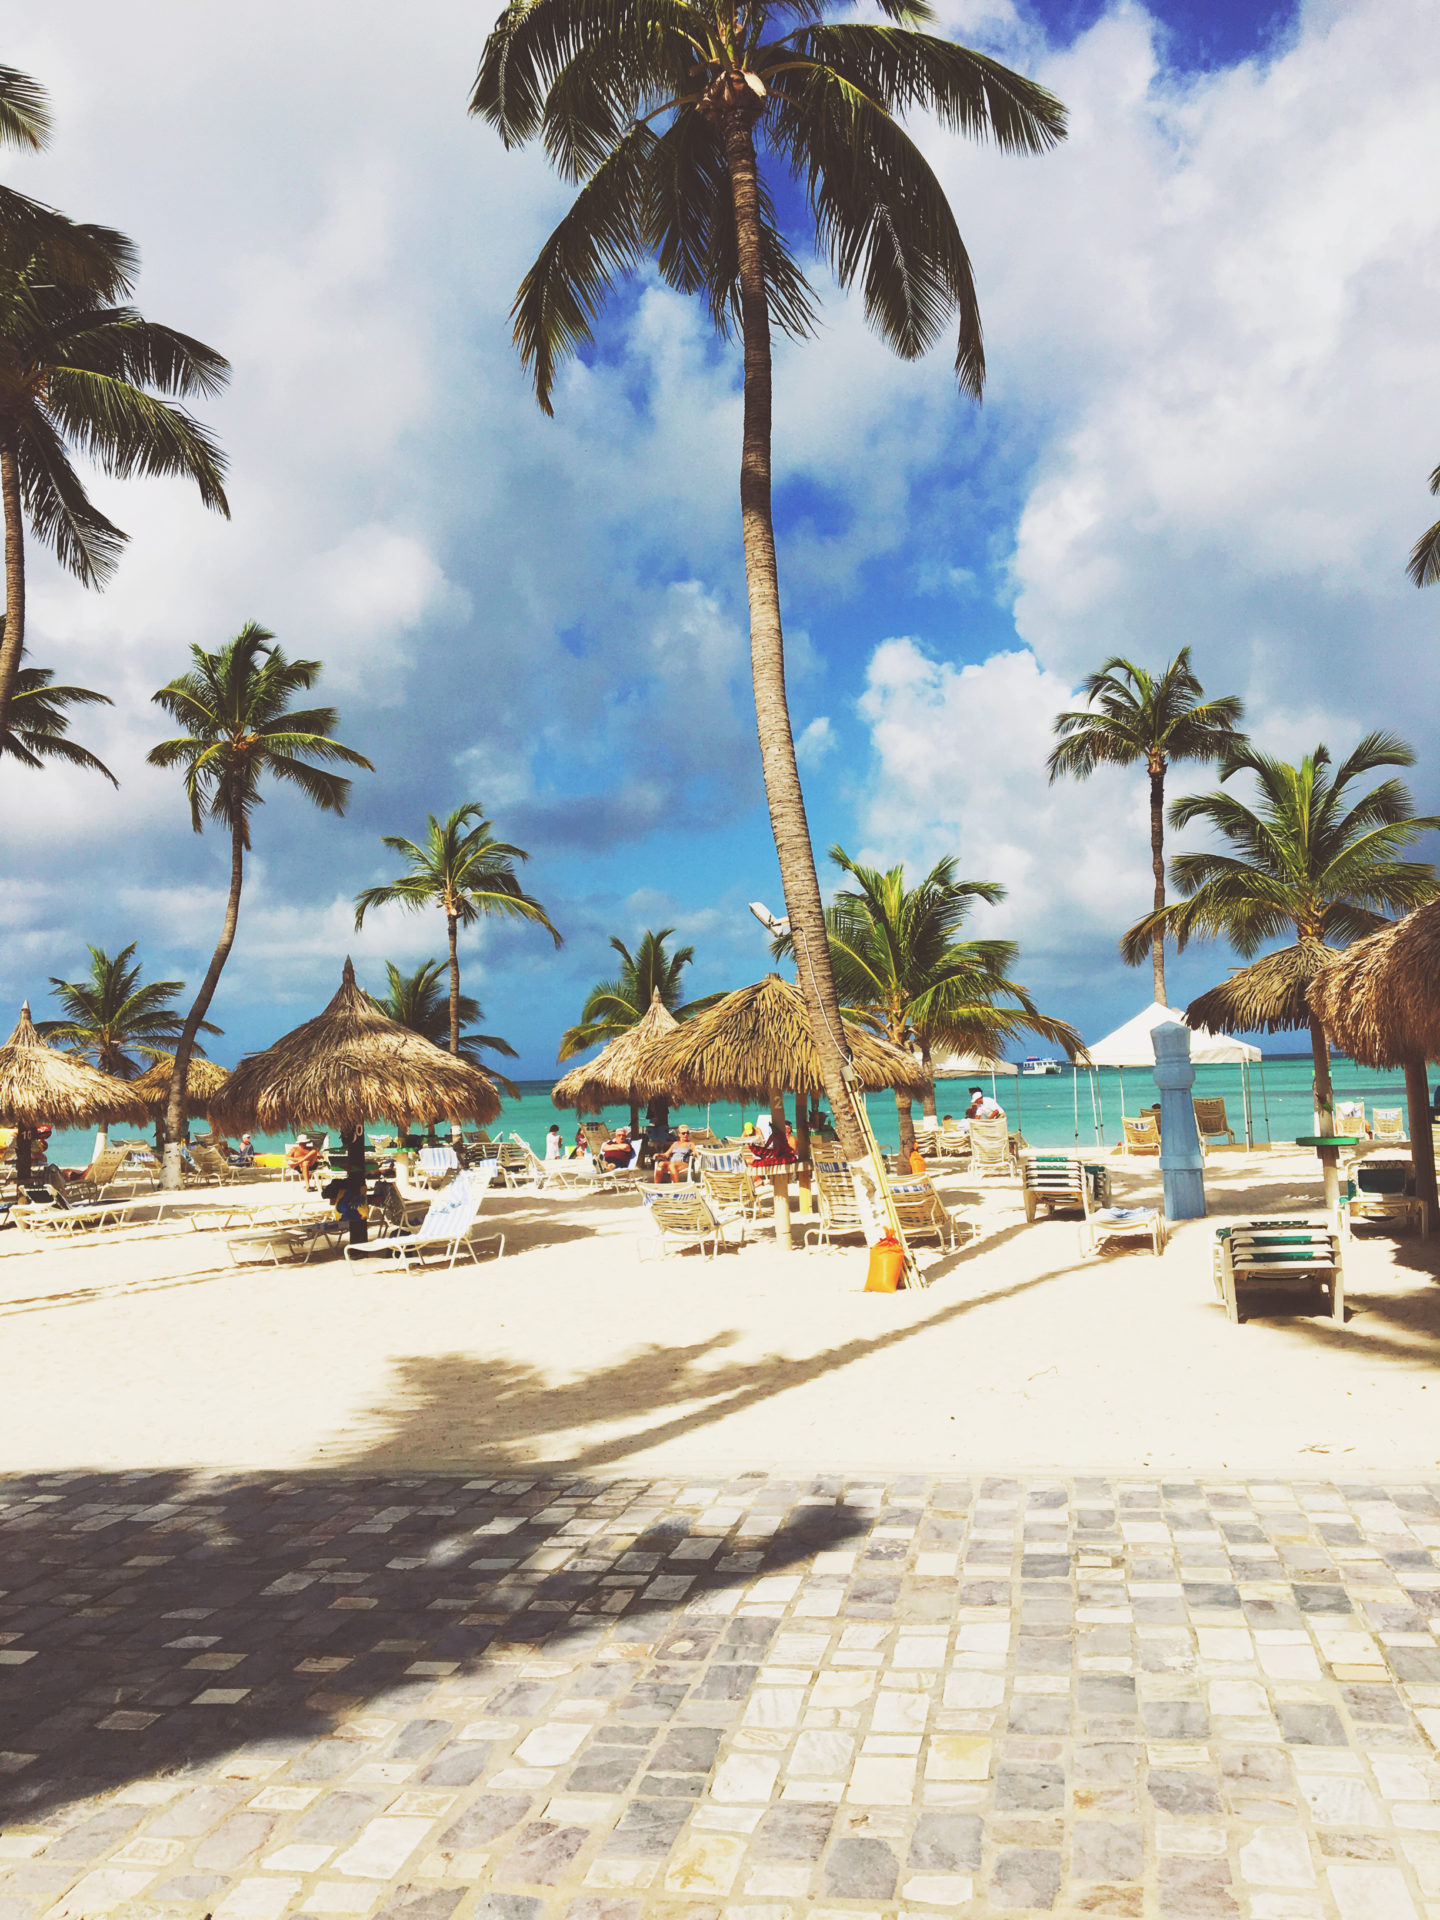 Holiday Inn-Aruba-Palm Beach-Palm Trees